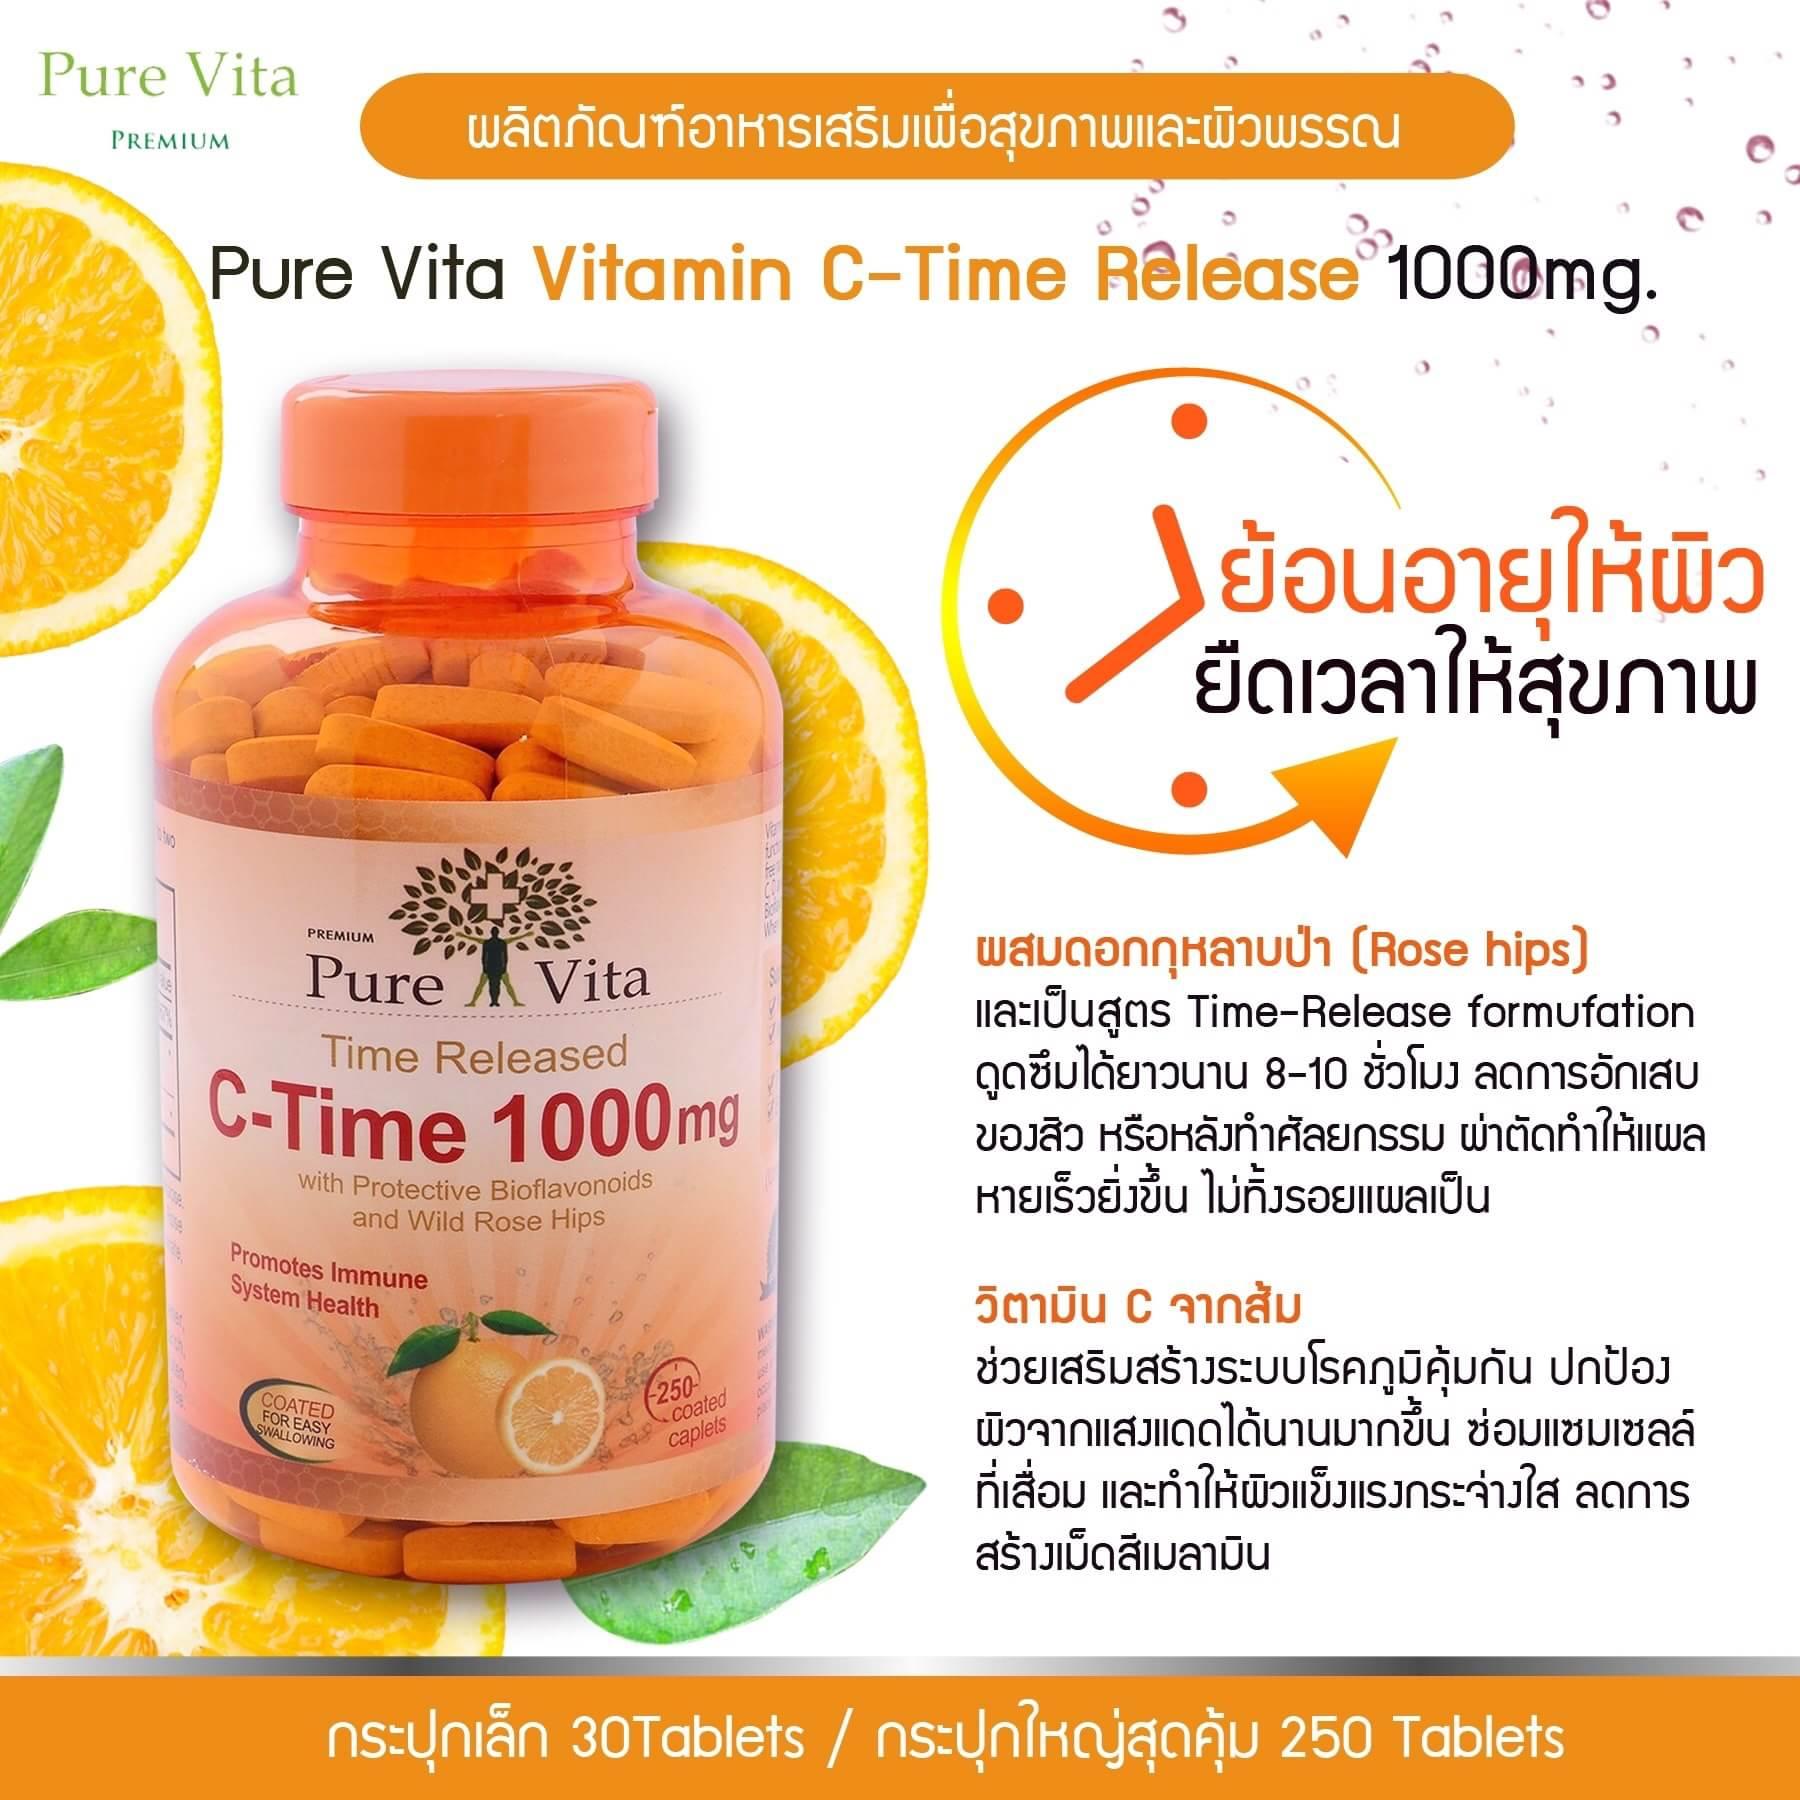 Pure Vita C-Time เพียว ไวต้า วิตามินซี 1000 มิลลิกรัม ผสม ดอกกุหลาบป่า (Rose hips) และเป็นสูตร Time-Release formulation ดูดซึมได้ยาวนาน 8-10 ชั่วโมง ขนาด250 เม็ด จากแคนนาดา